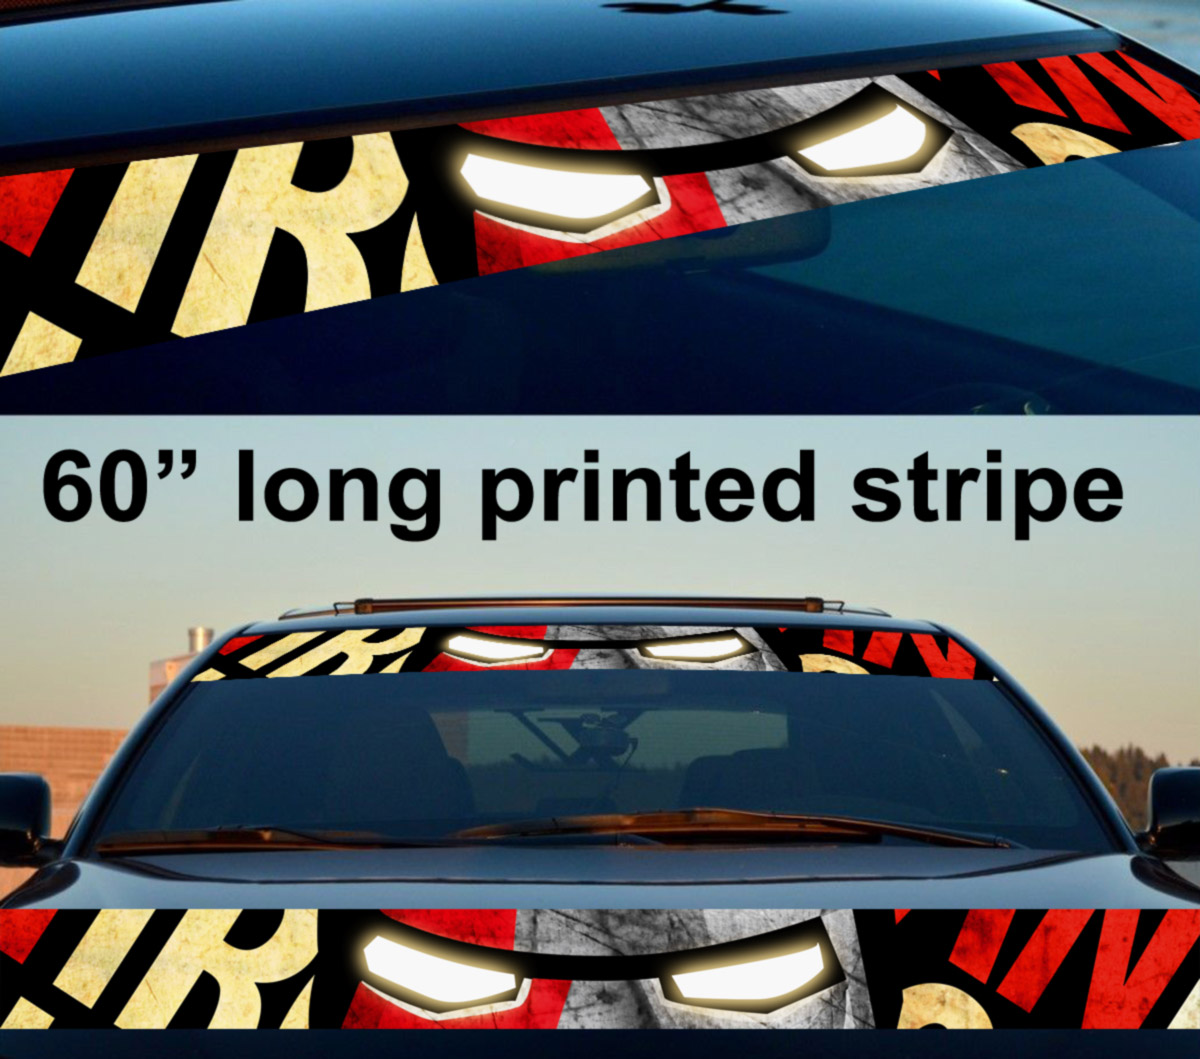 60 iron man sun strip printed windshield graphics car truck vinyl sticker decal